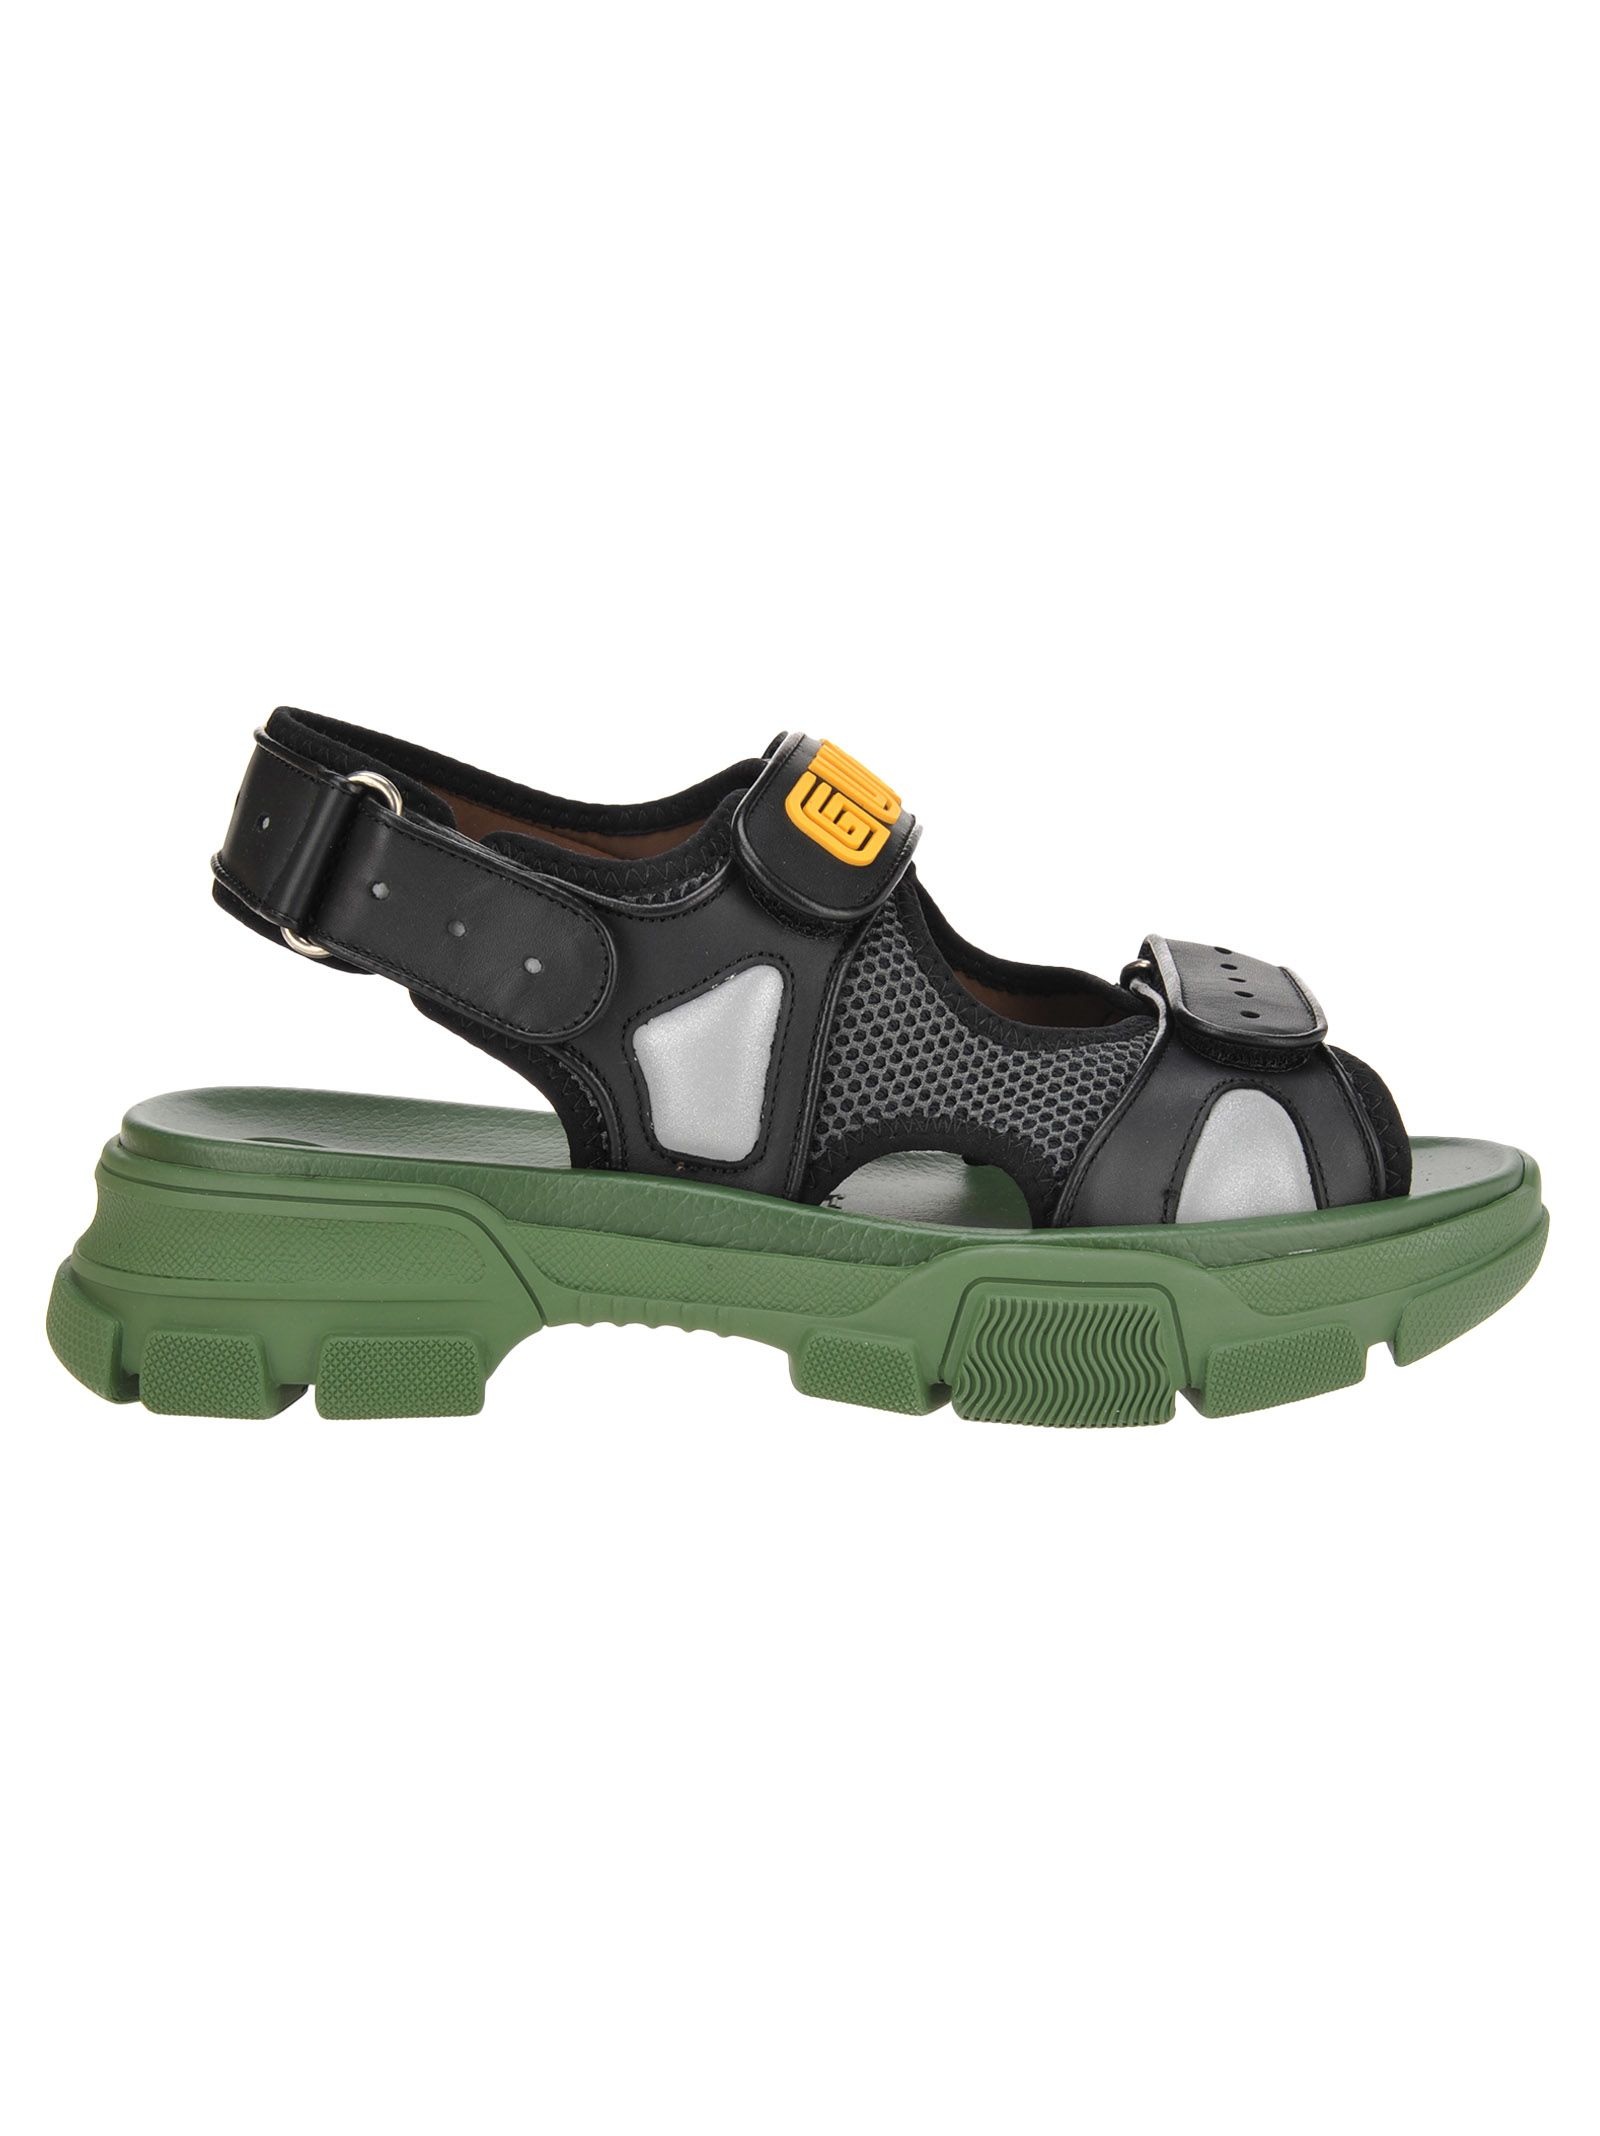 6b24d282744 Gucci Gucci Aguru Sandal - BLACK + GREEN - 10831701